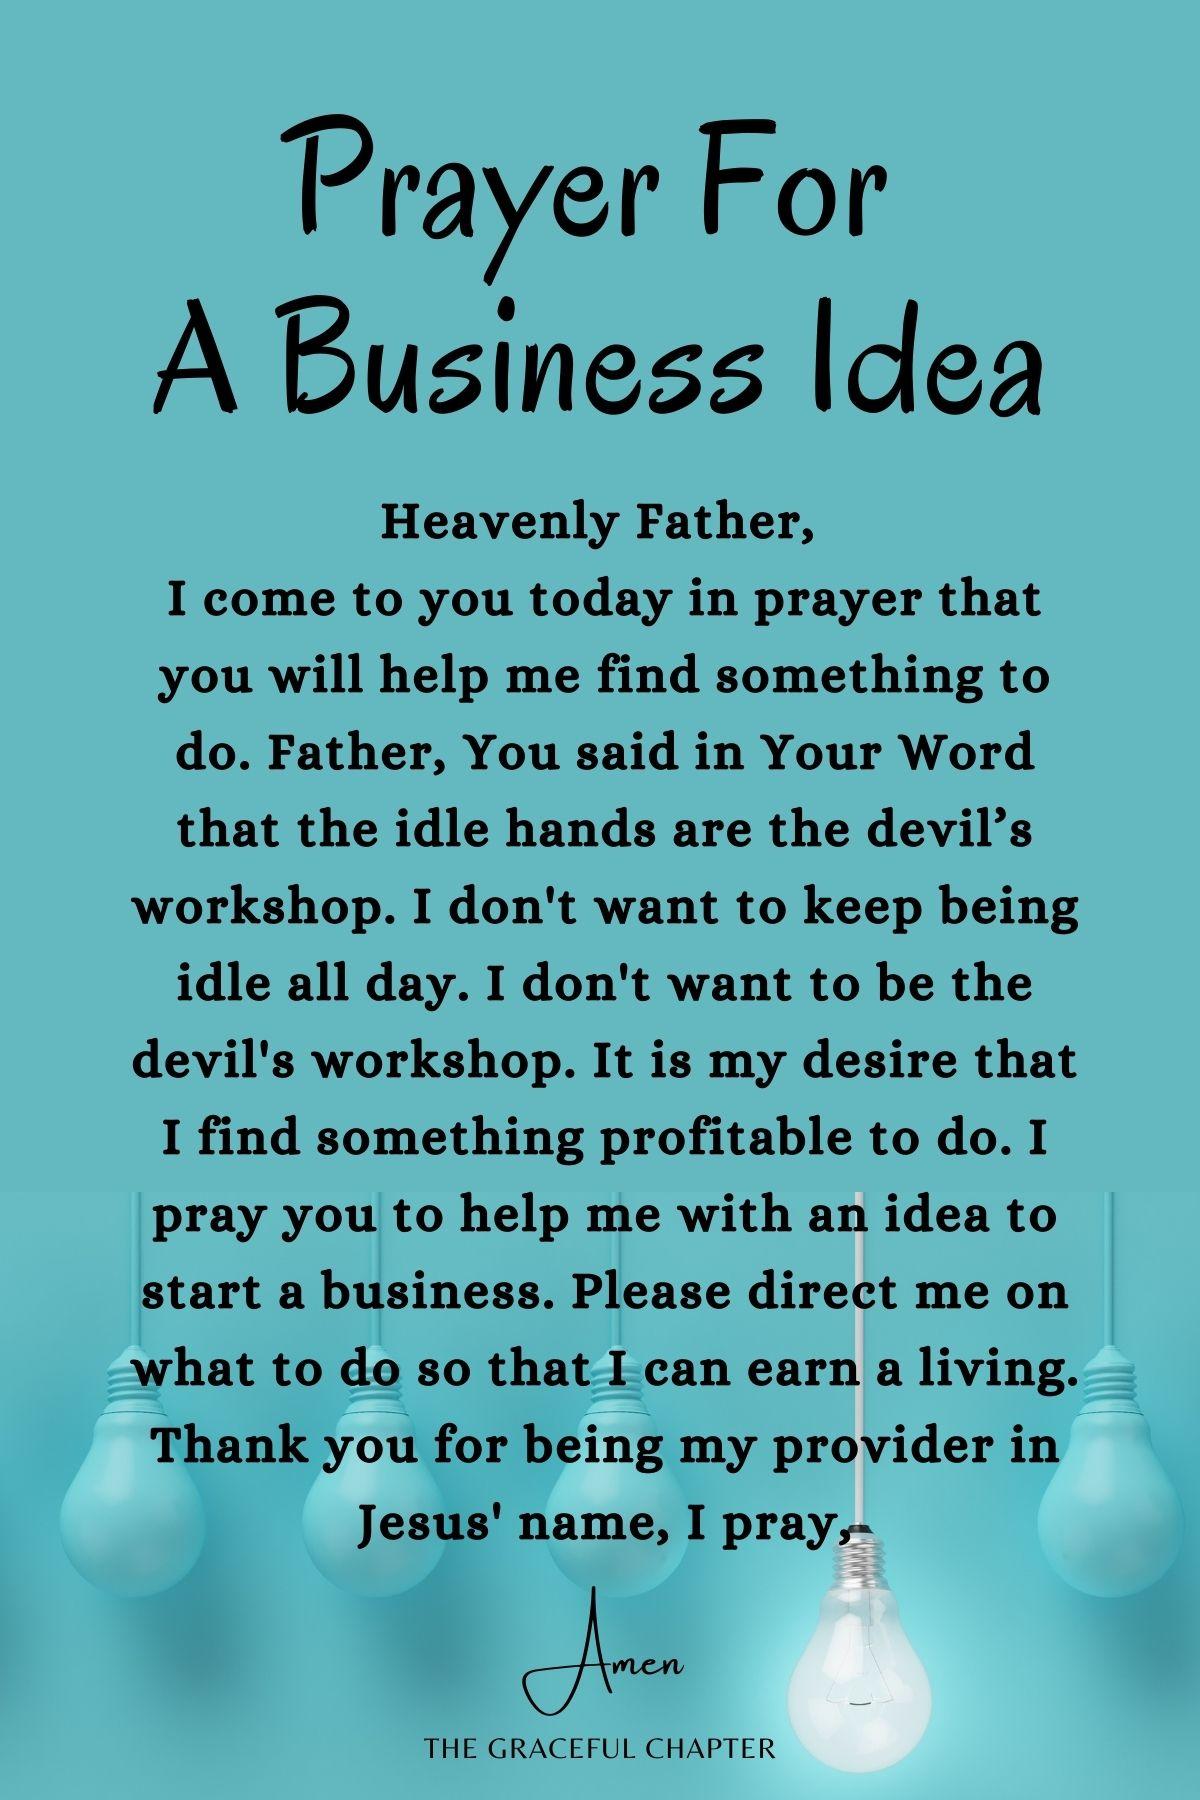 Please give me a business idea